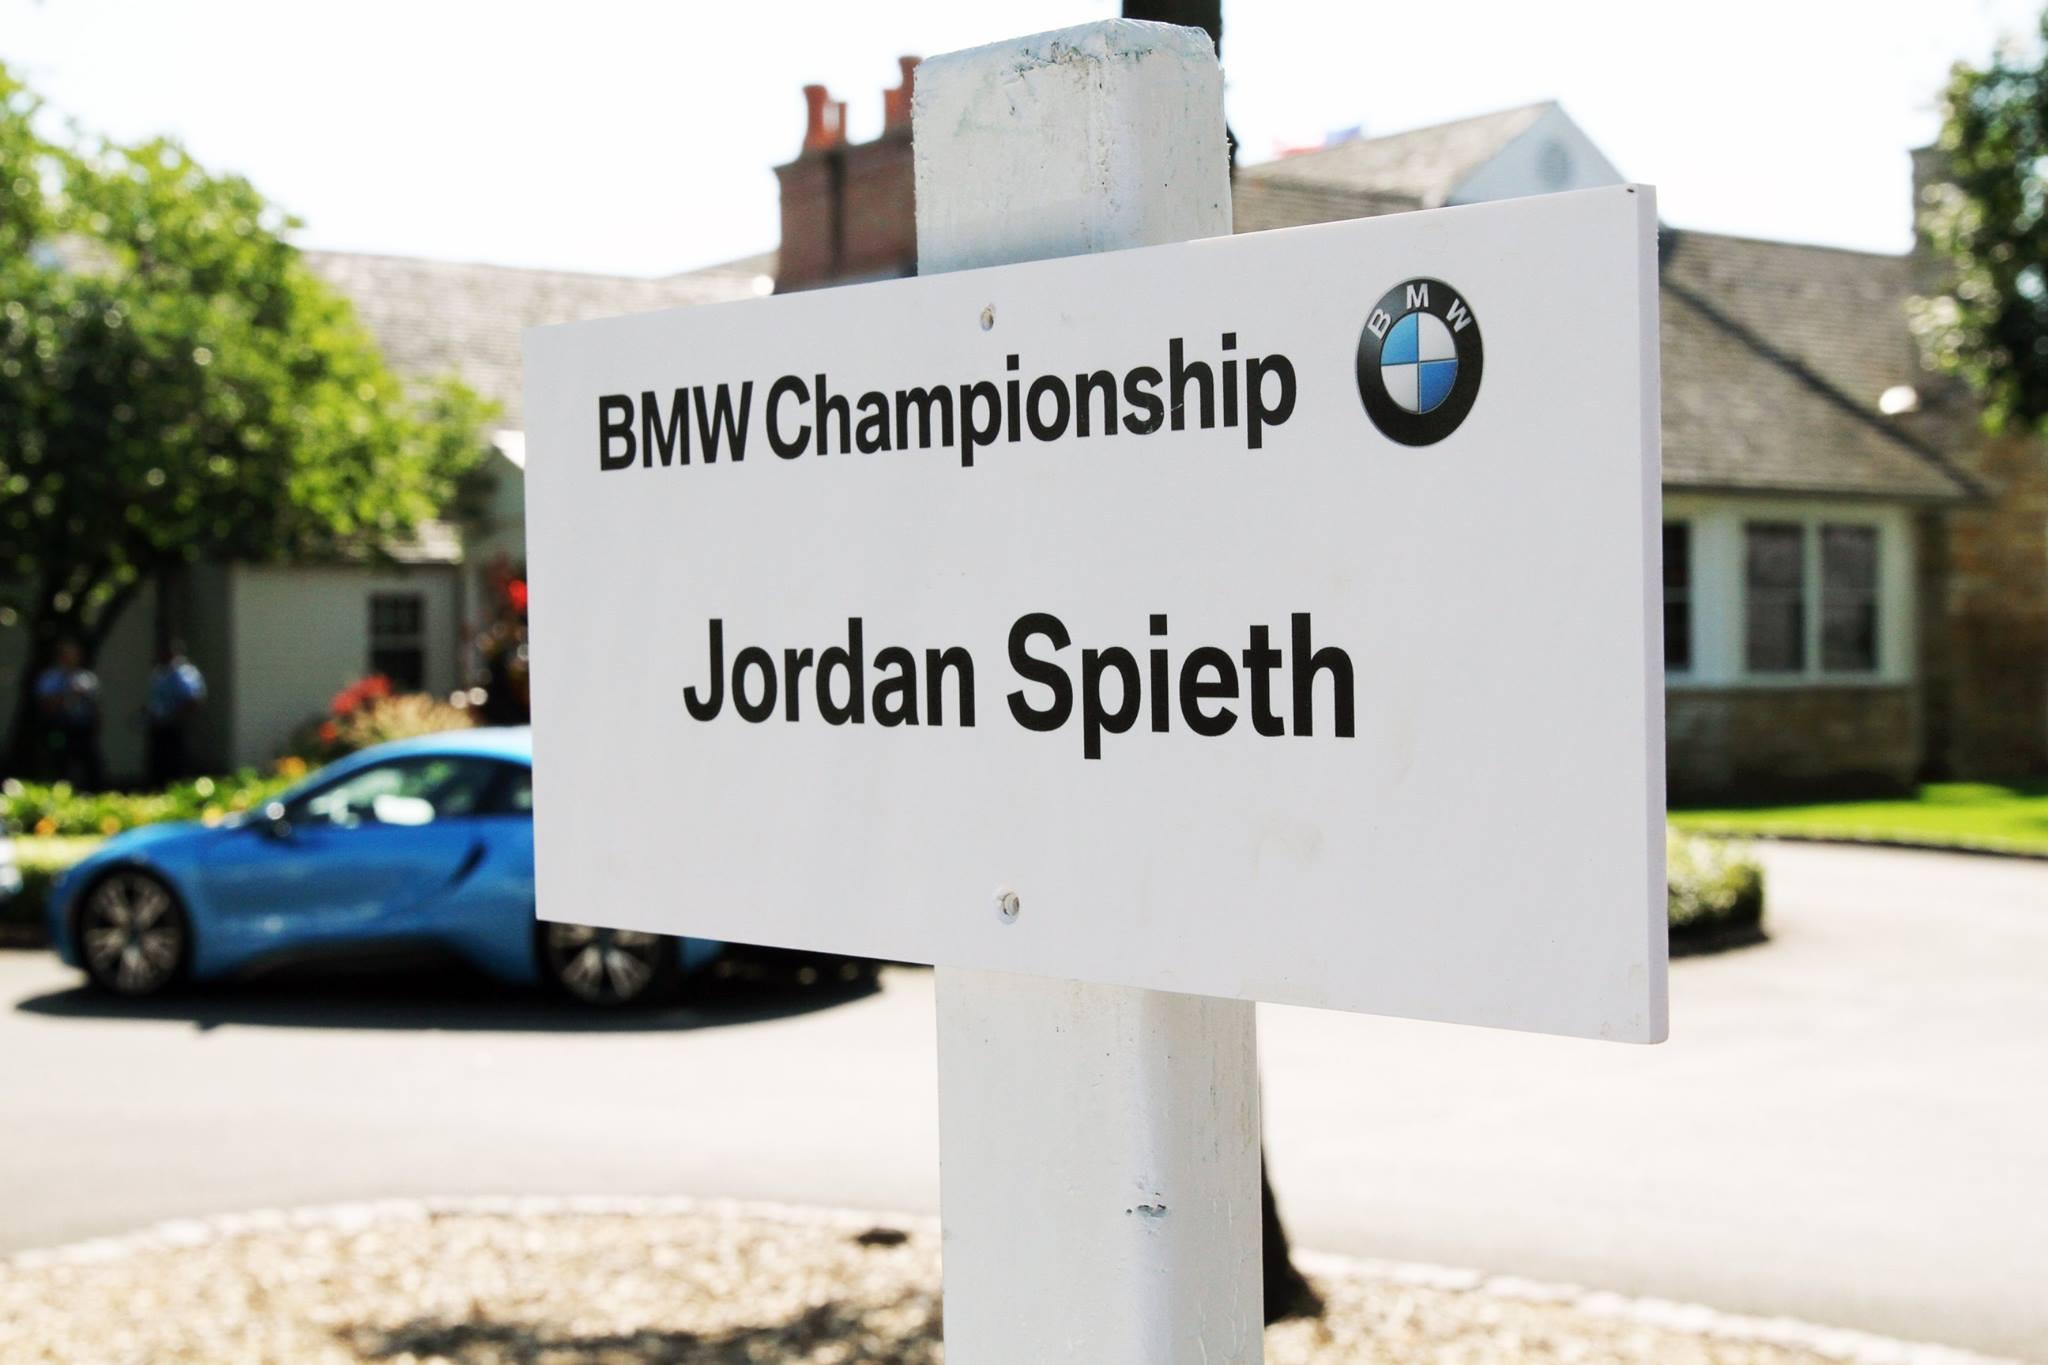 2015 BMW Championship